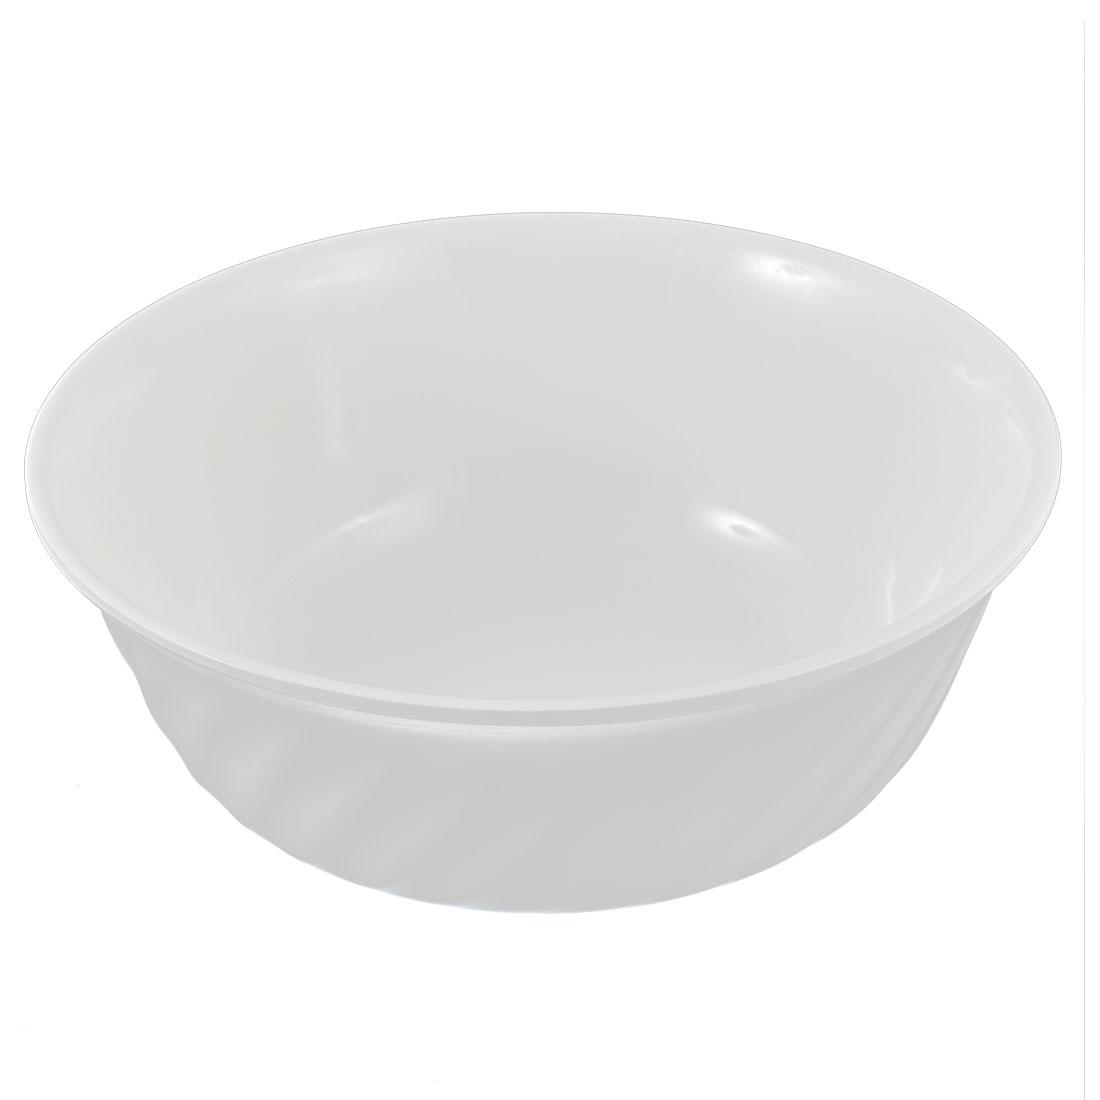 "Home Restaurant Kitchen Party Salad Rice Soup Serving Bowl White 8"" Dia"